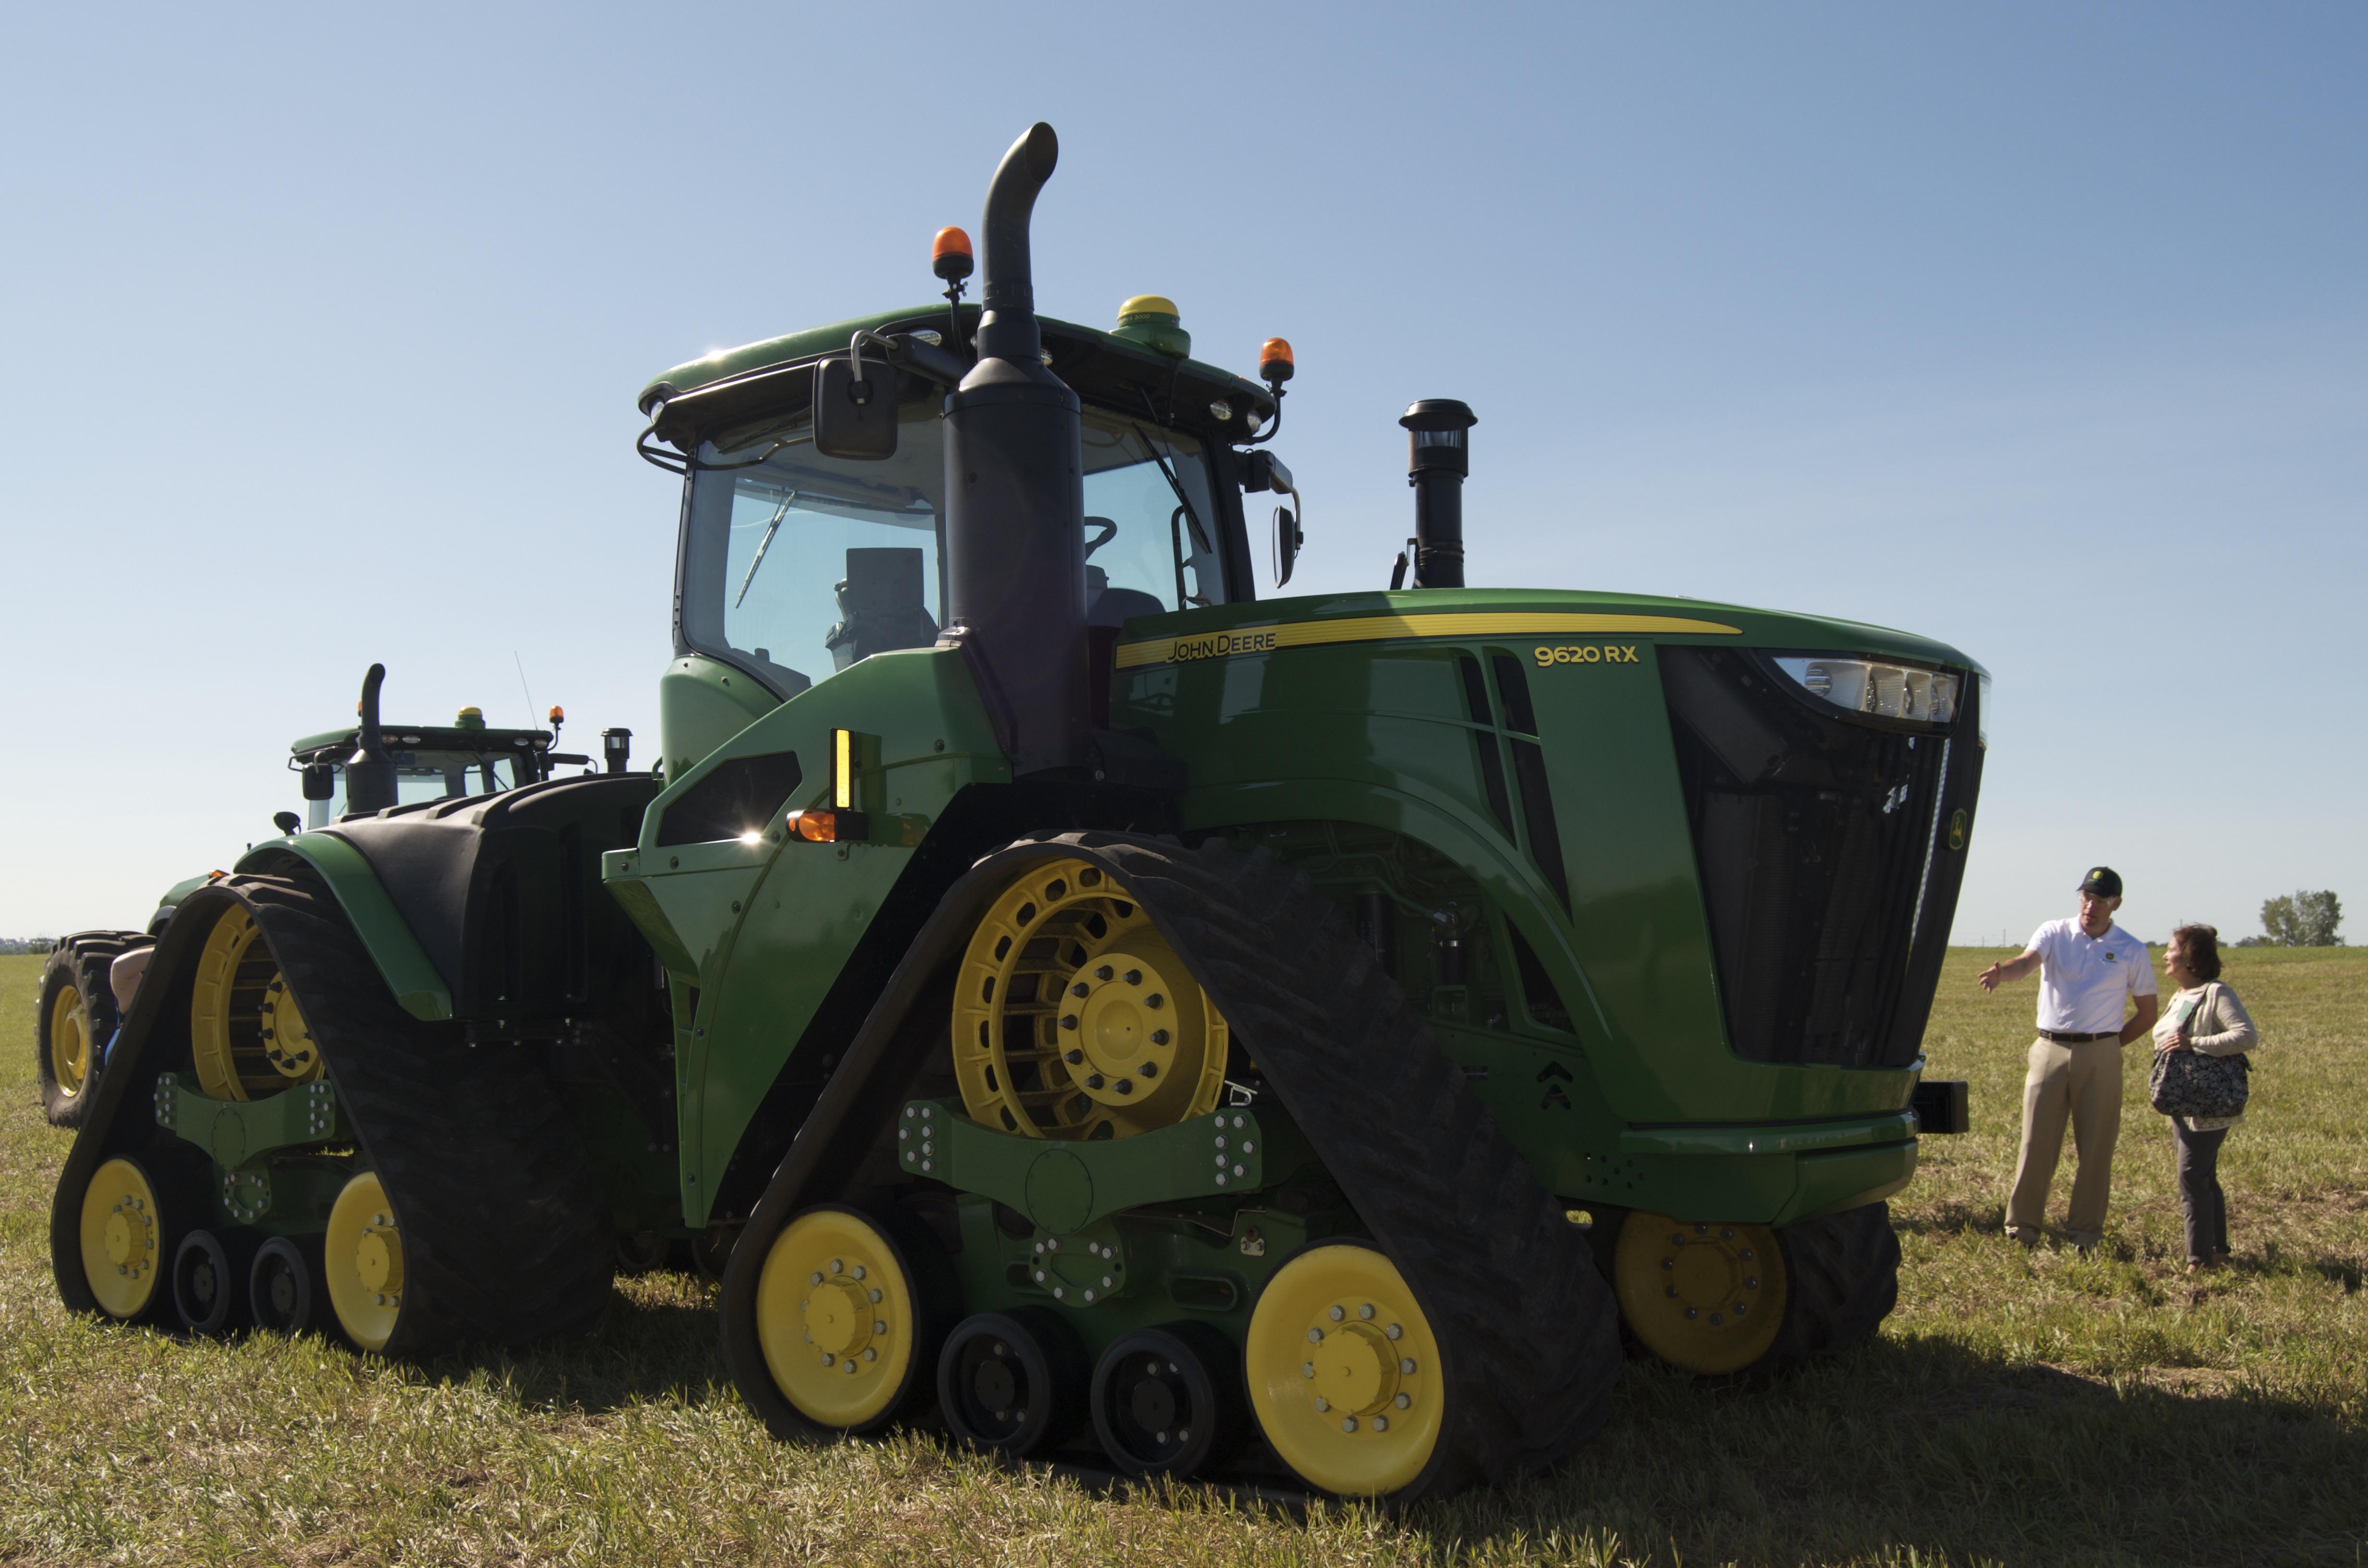 John Deere Tractors Product : John deere unveiled new track rx series tractors